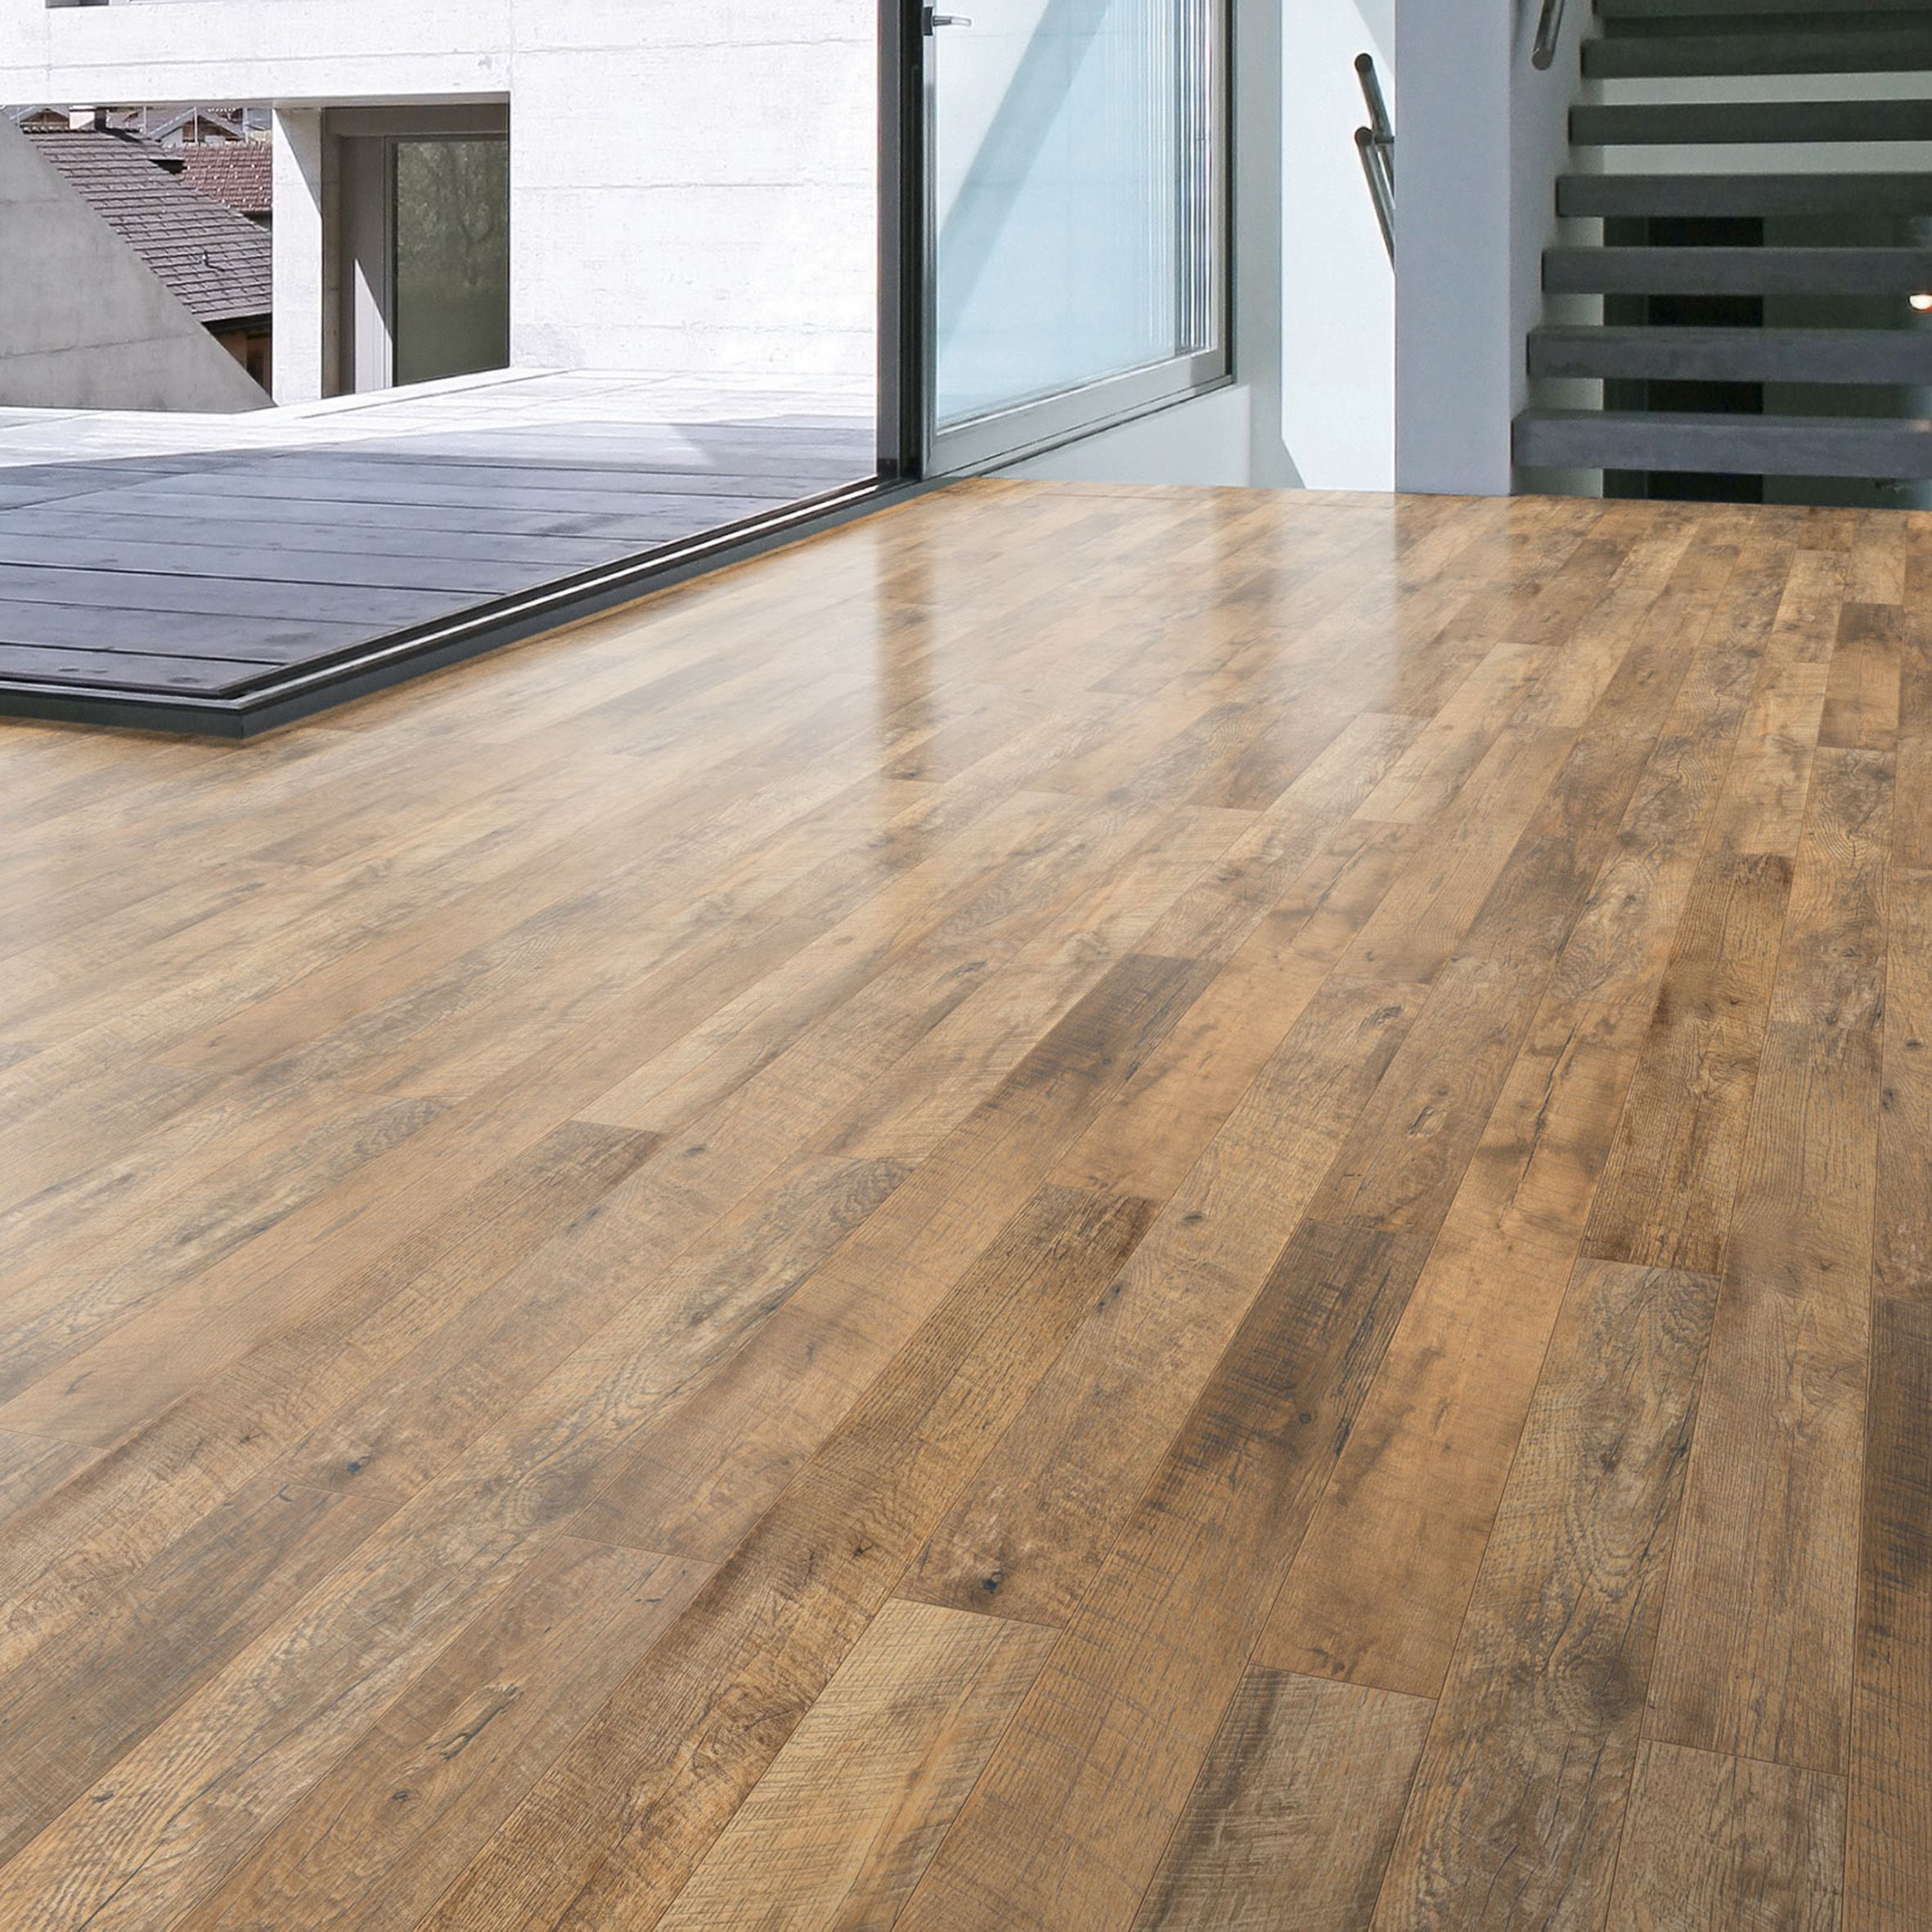 Guarcino Reclaimed Oak Effect Laminate Flooring 1 64 M² Pack